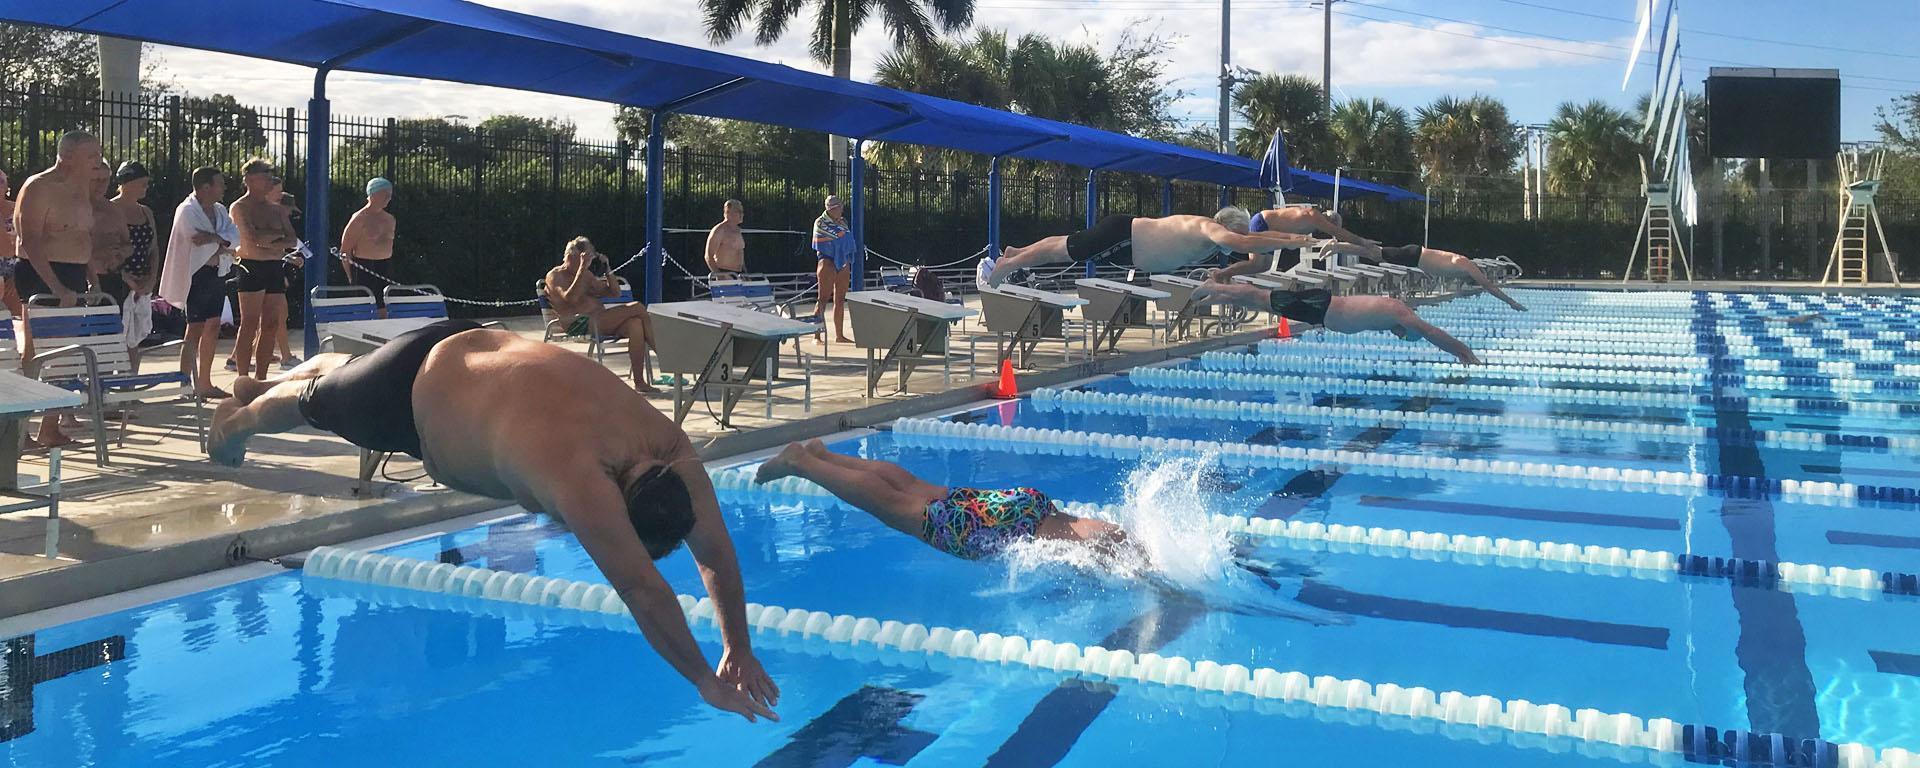 Martin County Senior Games participants diving into the swim races.